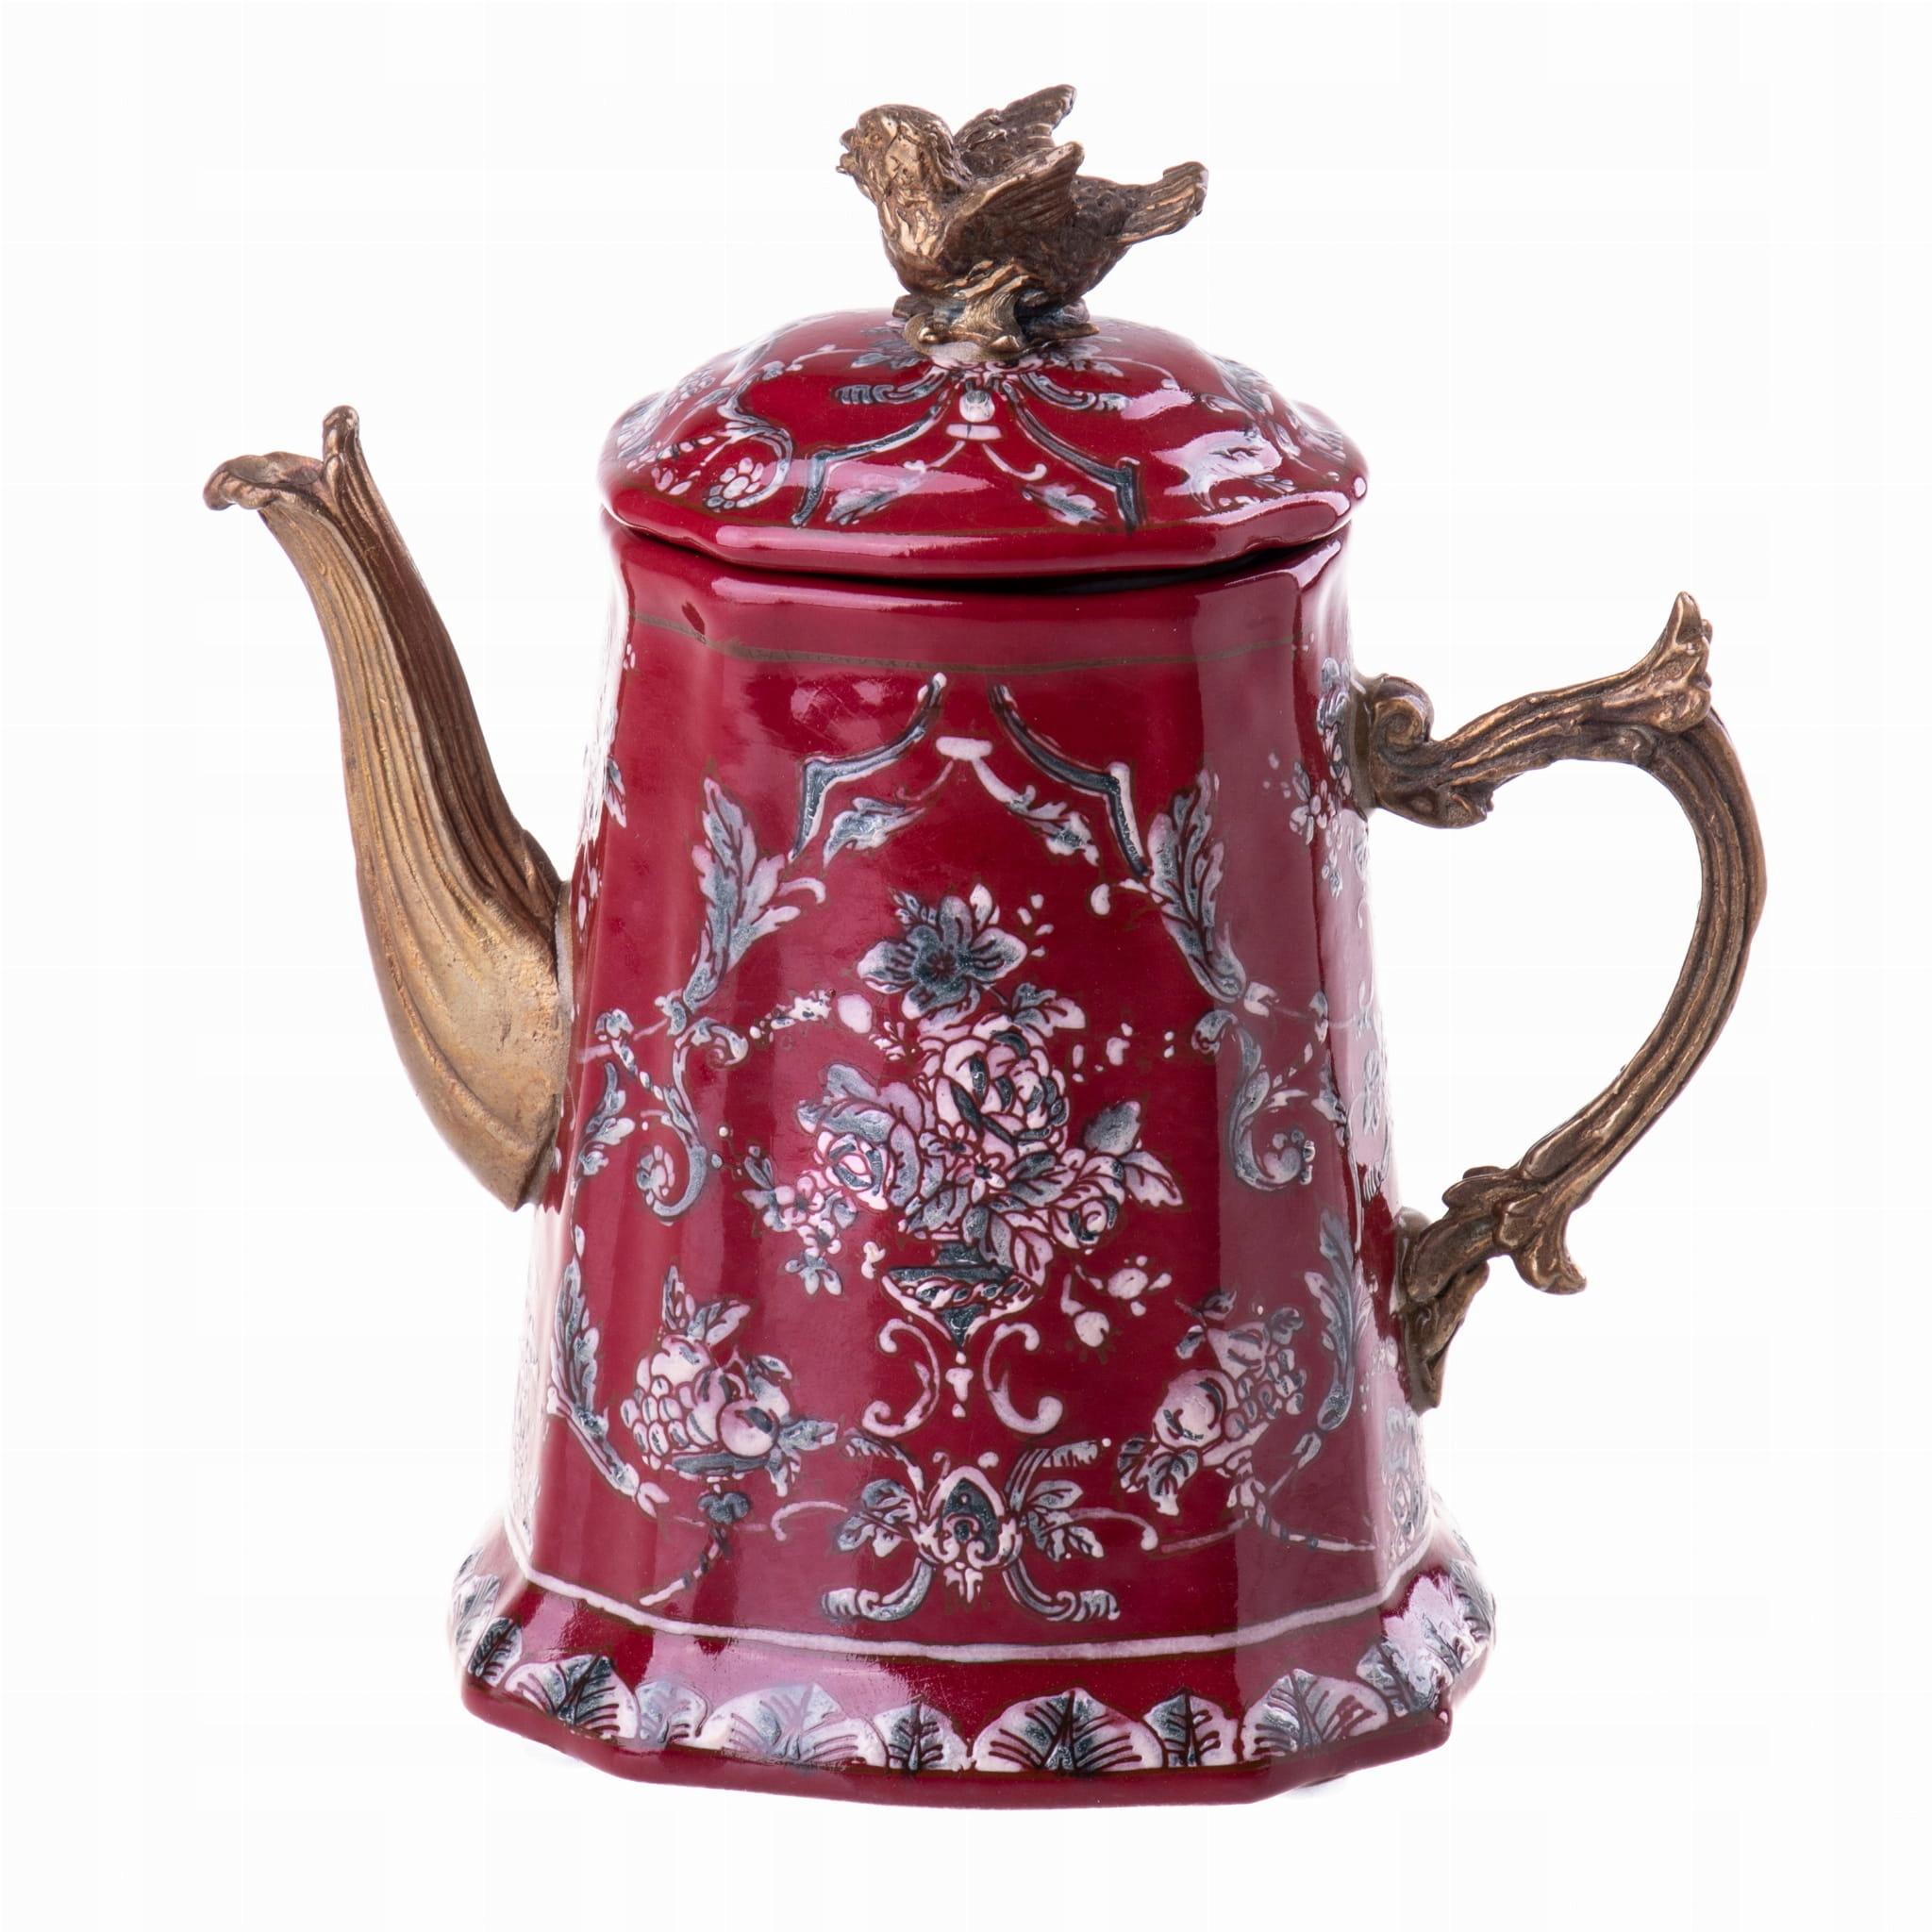 Dekoratívny červený porcelánový džbán